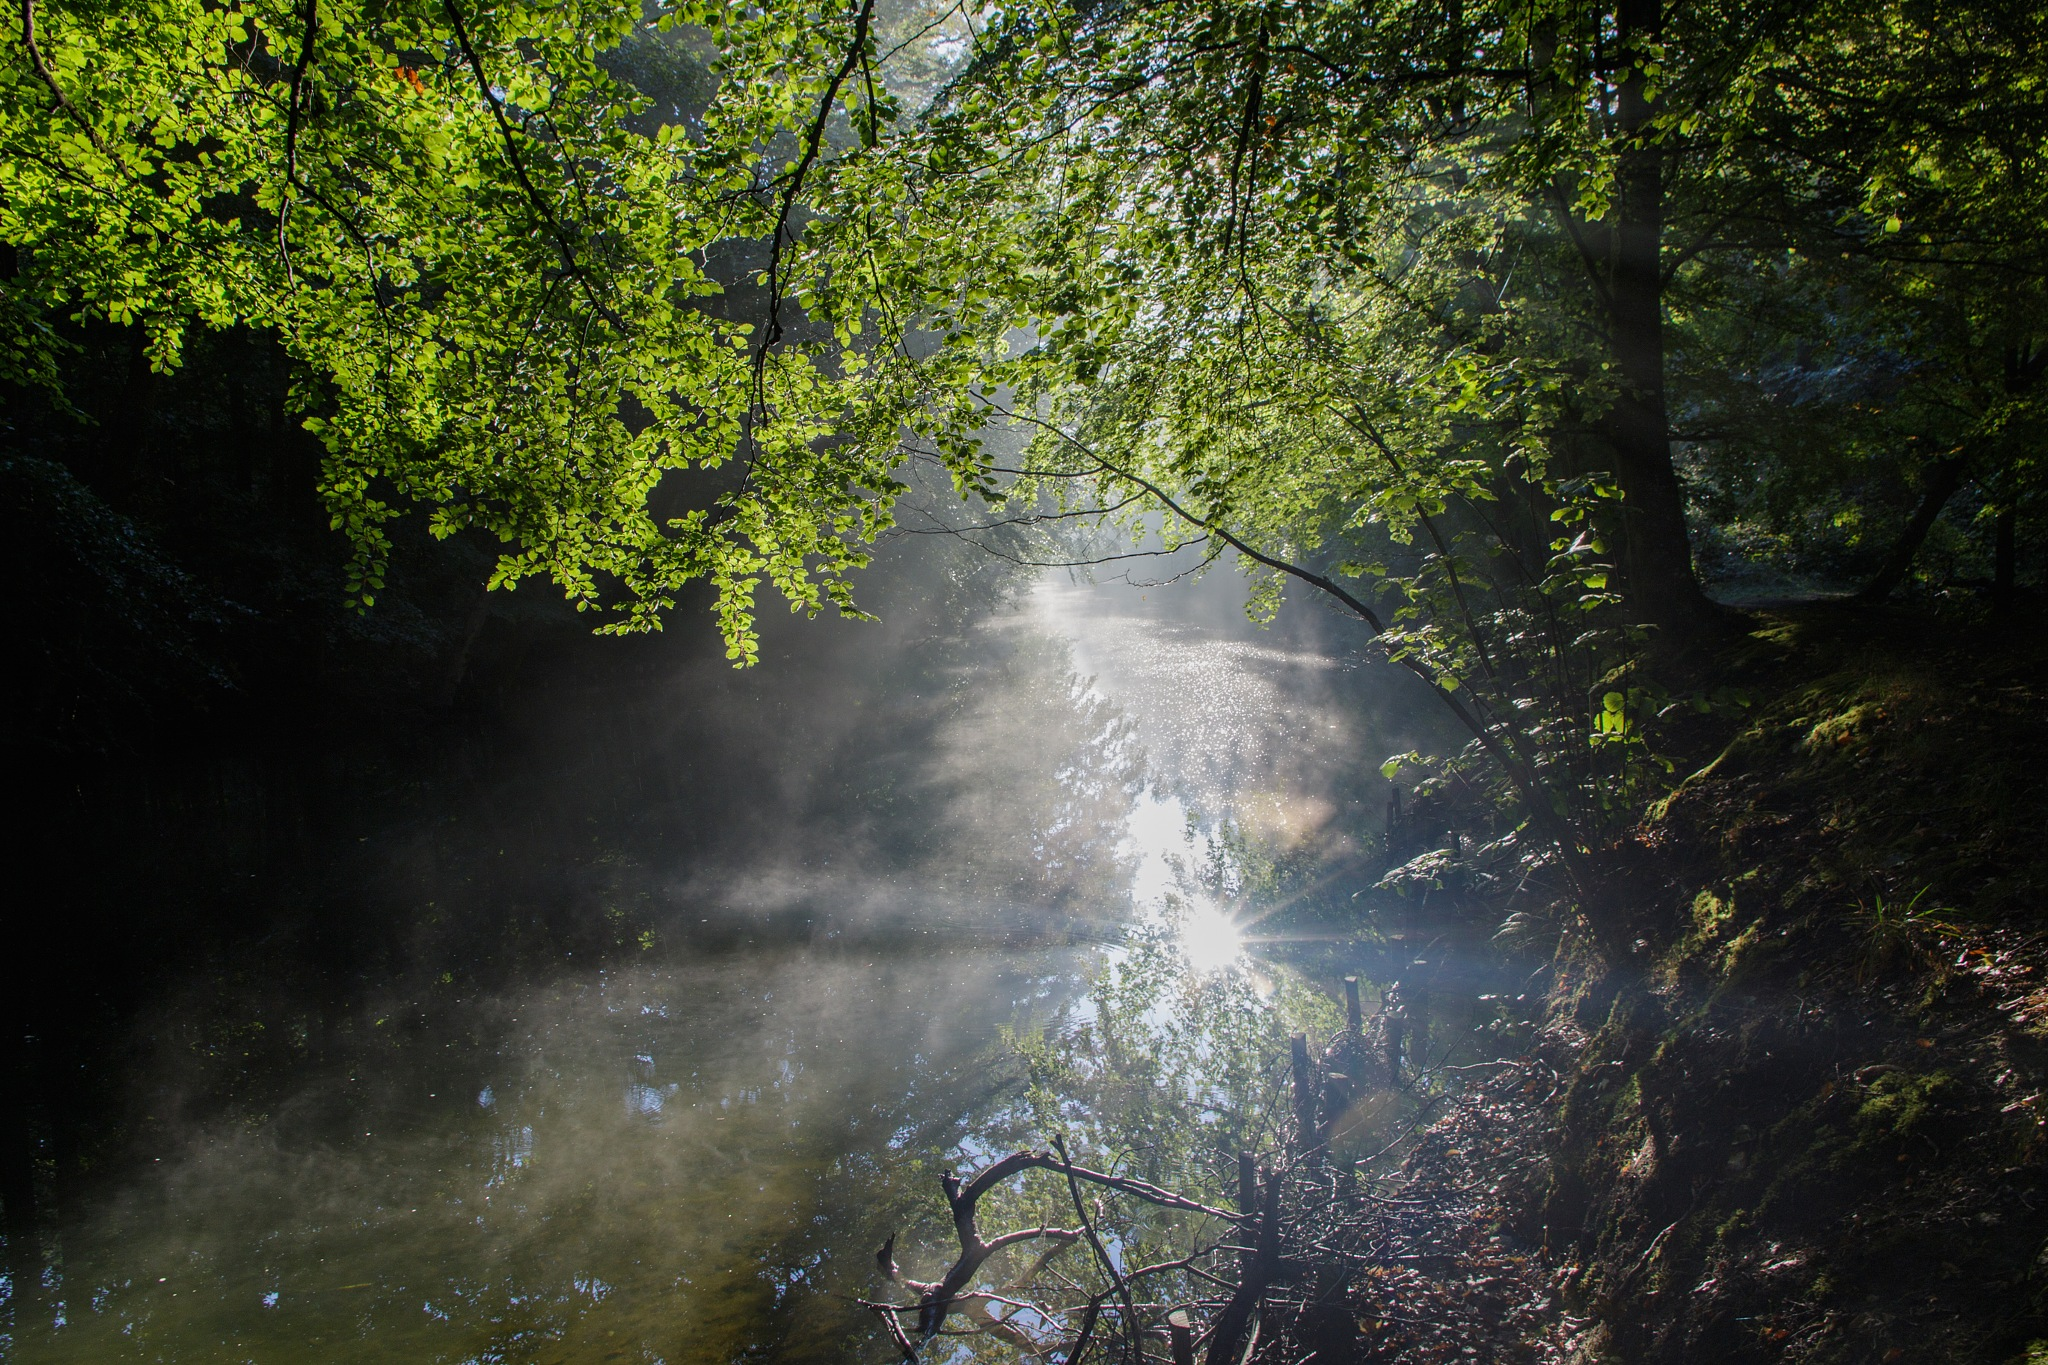 Morning mist and sunrise at the small river by Bjarne Gertz Pedersen